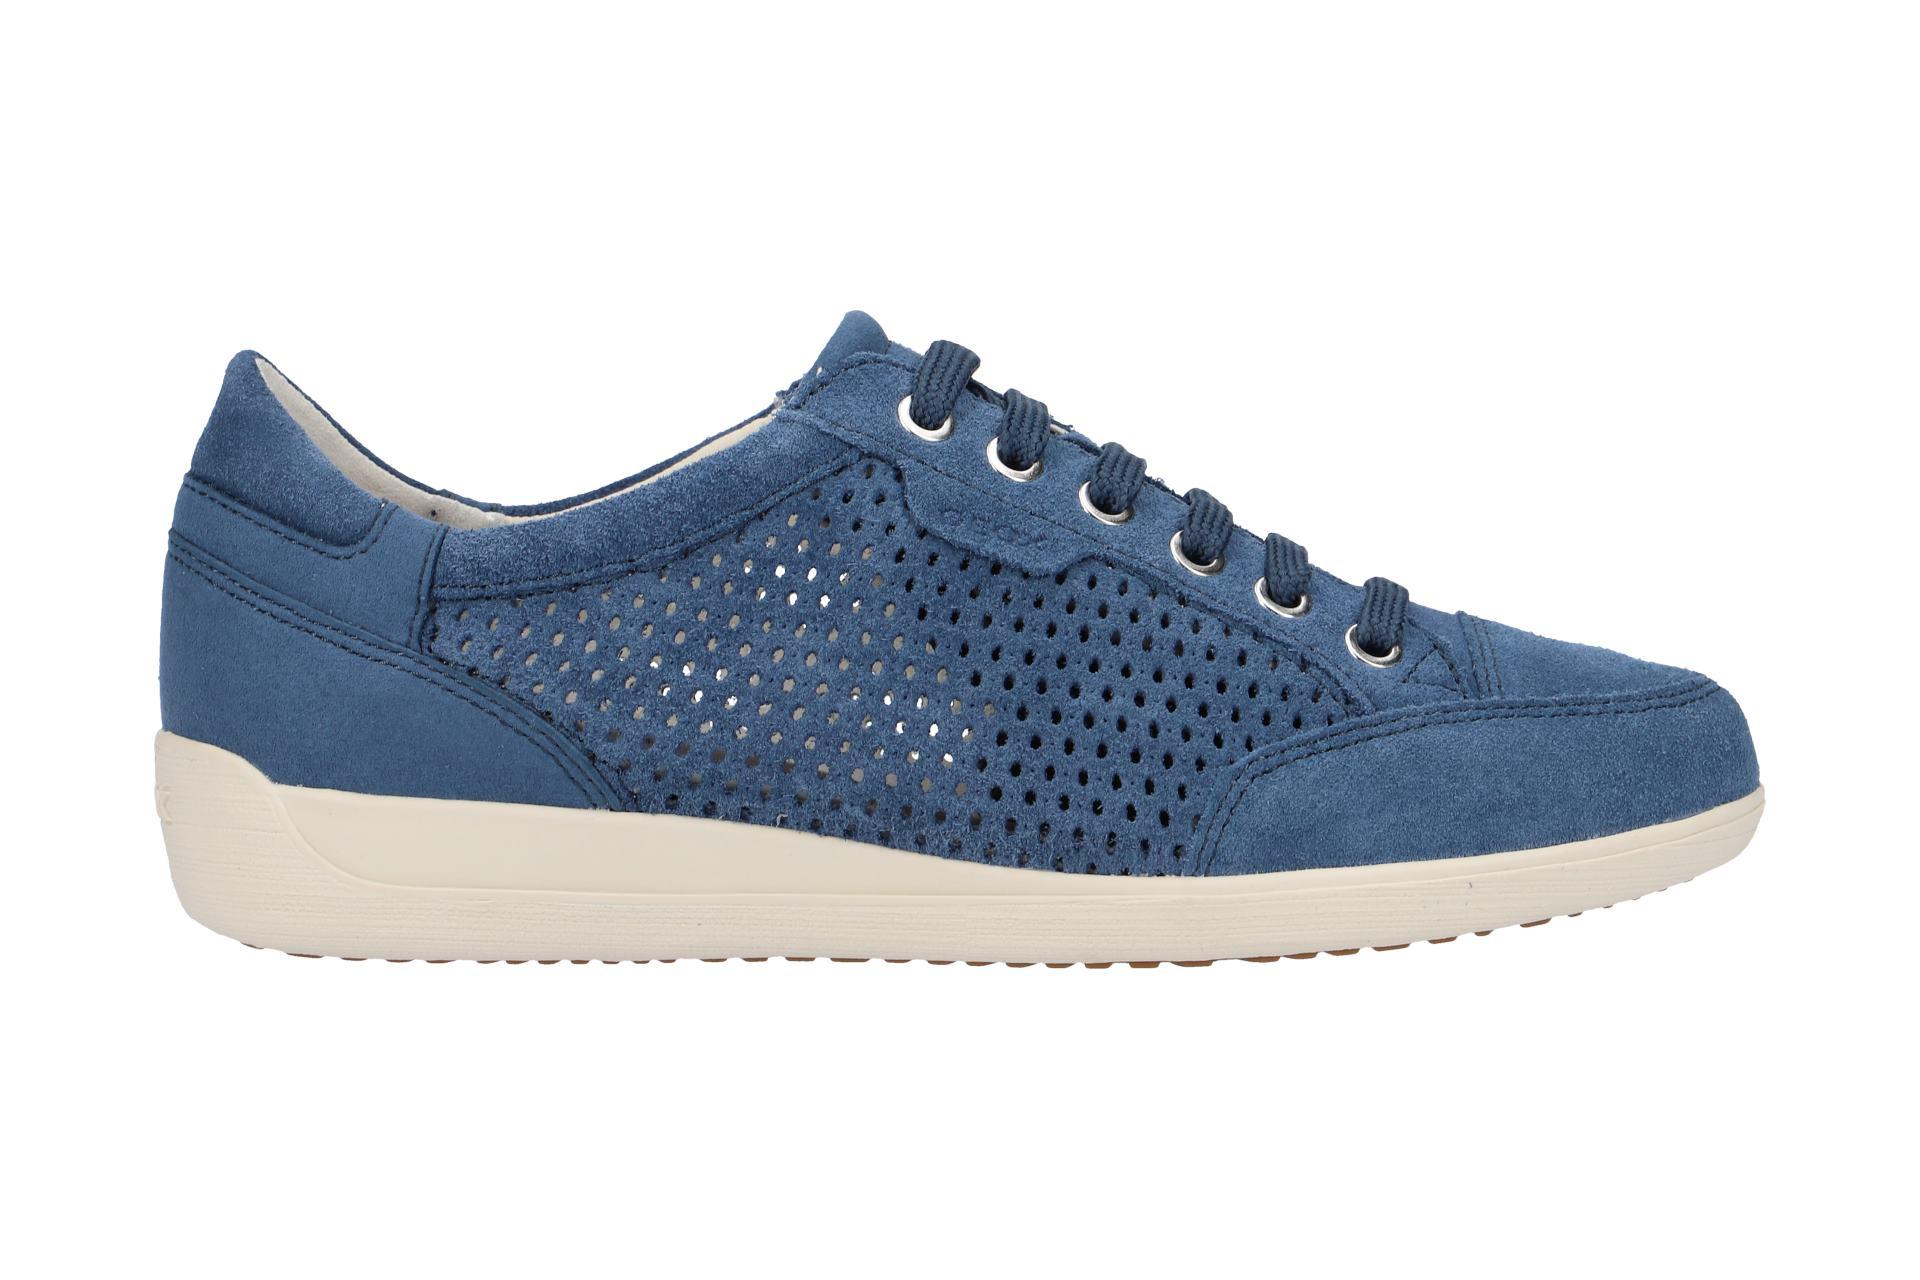 Schuhe Halbschuhe Blau Myria Details Damenschuhe D6268b C4008 Neu 00022 Geox Zu Y7Im6vfybg